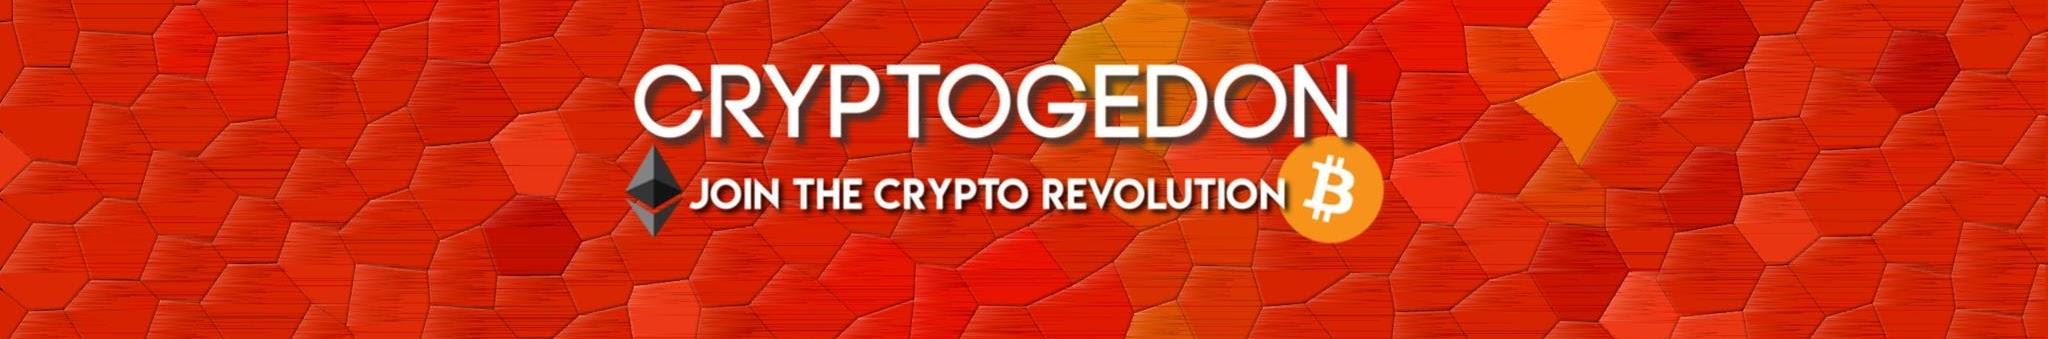 Cryptogedon